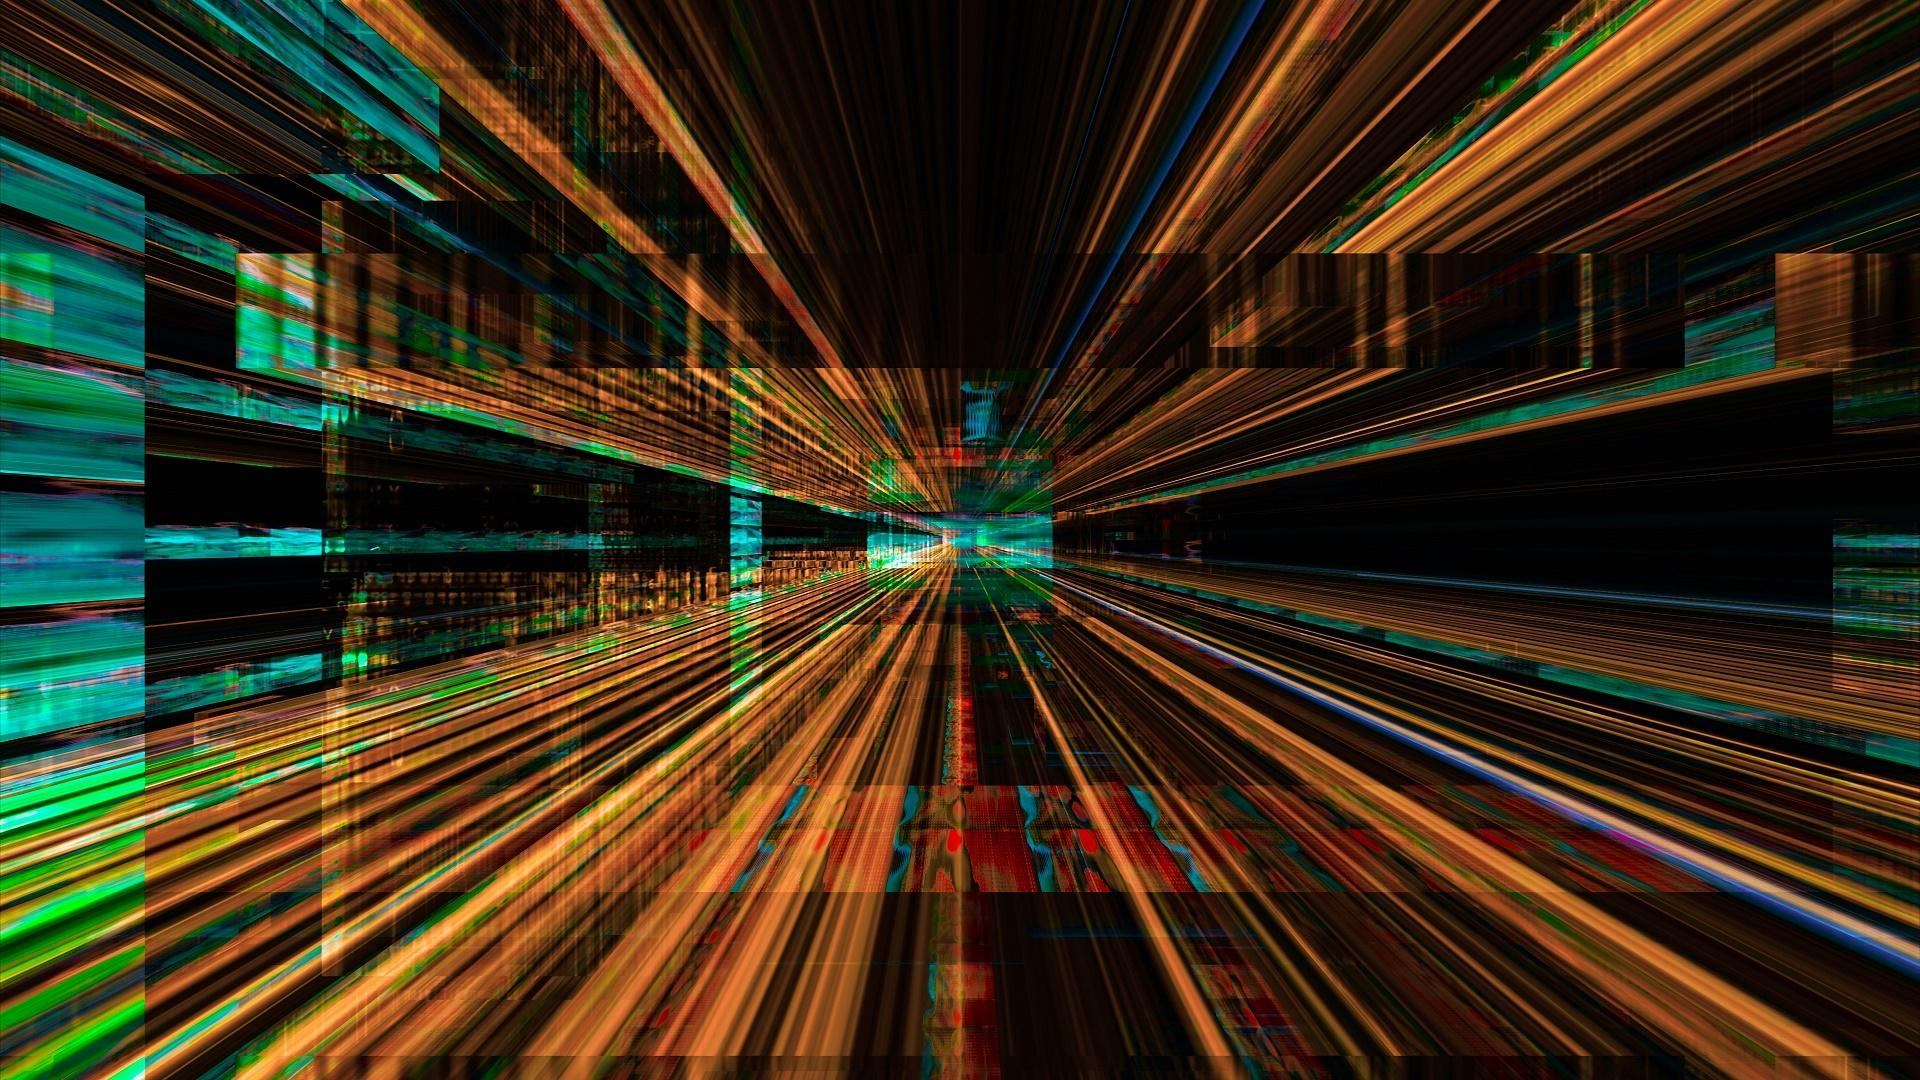 Digital Light wallpapers HD quality